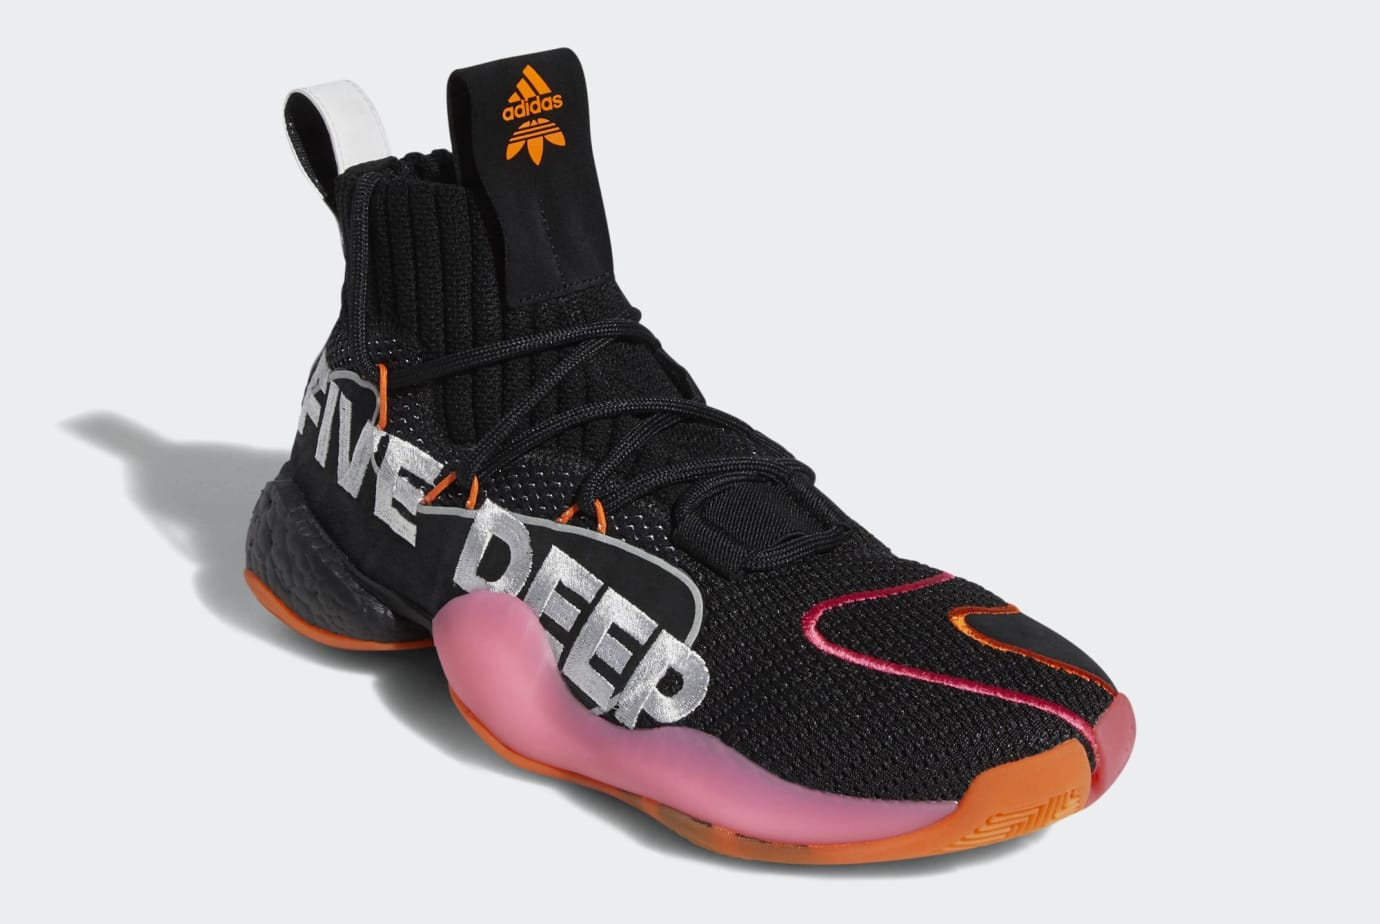 huge selection of 2bd84 723ae Image via US11 · Adidas Crazy BYW X PE  Wall Way  Core Black Footwear White  Orange